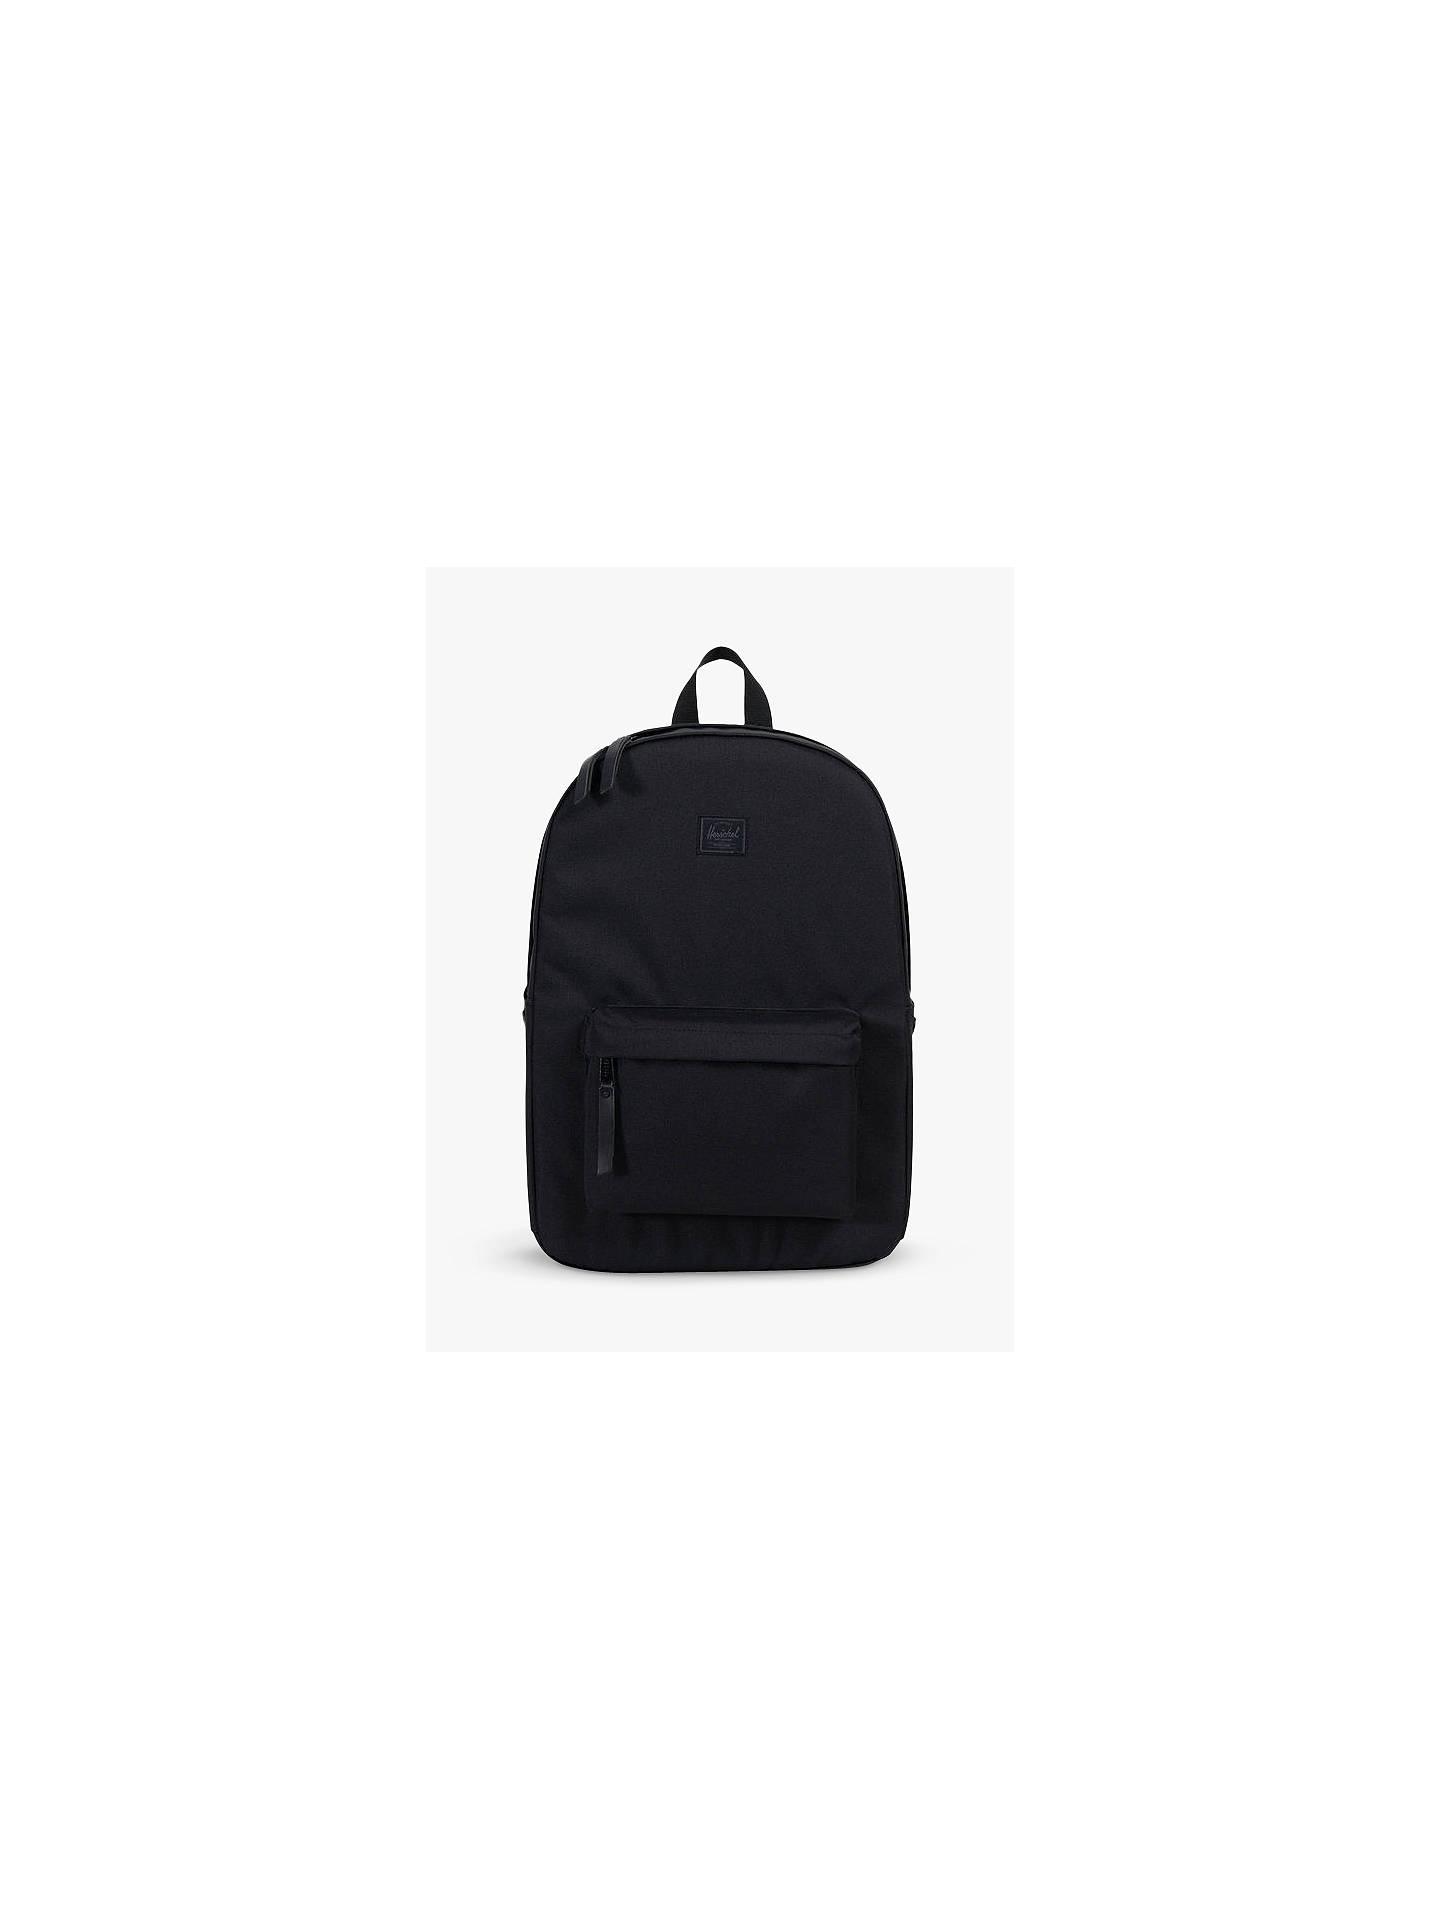 f75cb83835a Buy Herschel Supply Co. Winlaw Backpack, Black Online at johnlewis.com ...